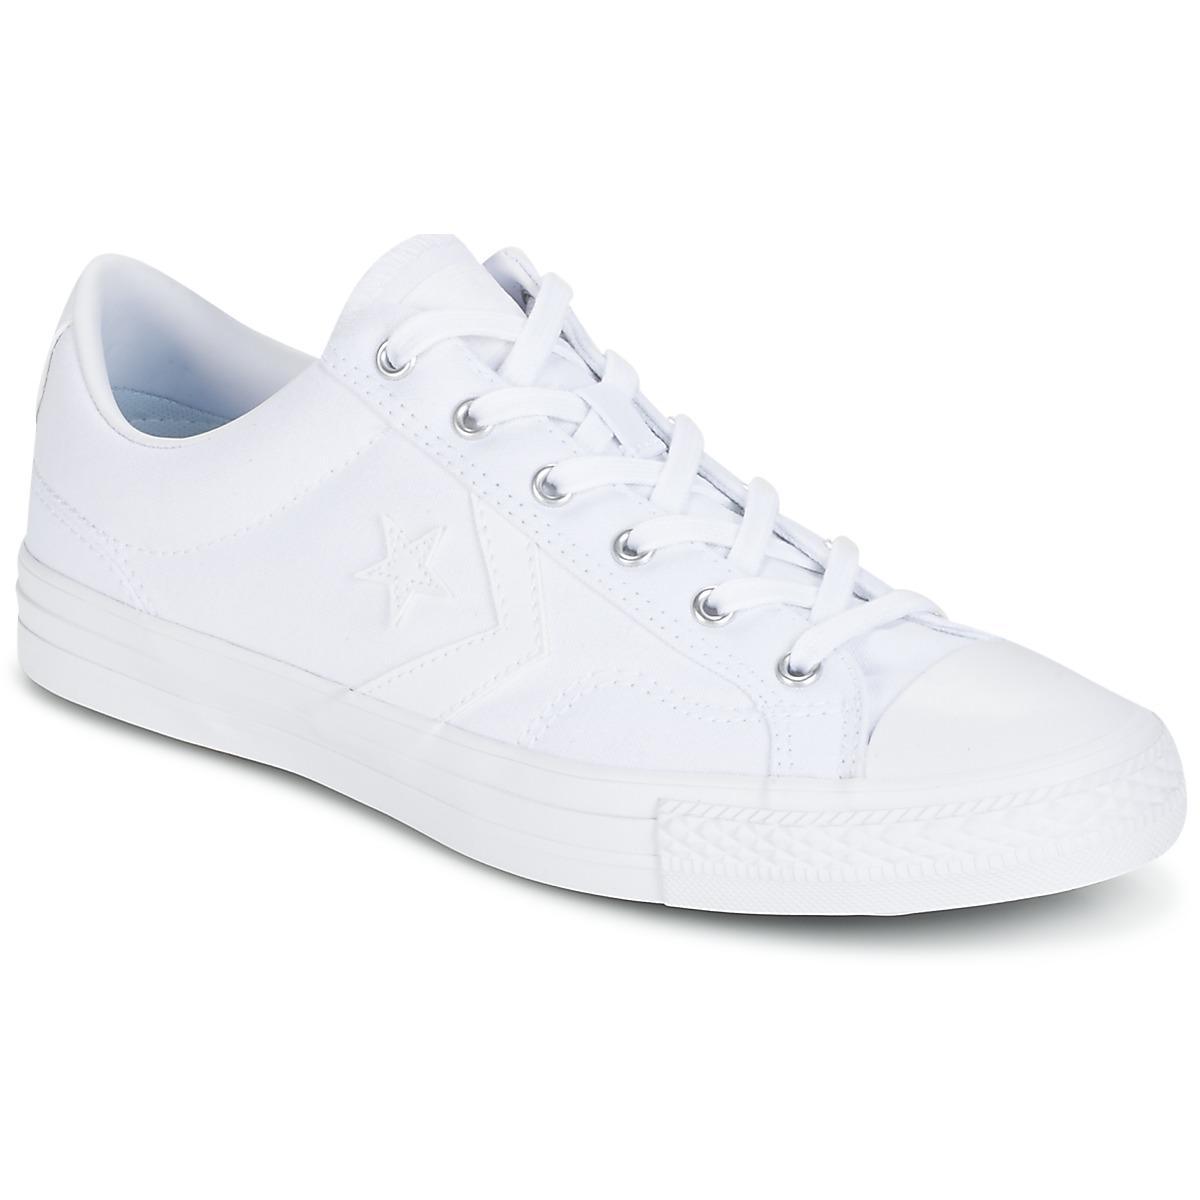 e137e0c4a4c0 Converse - Star Player Canvas With Gum Ox White white white Shoes  (trainers. View fullscreen